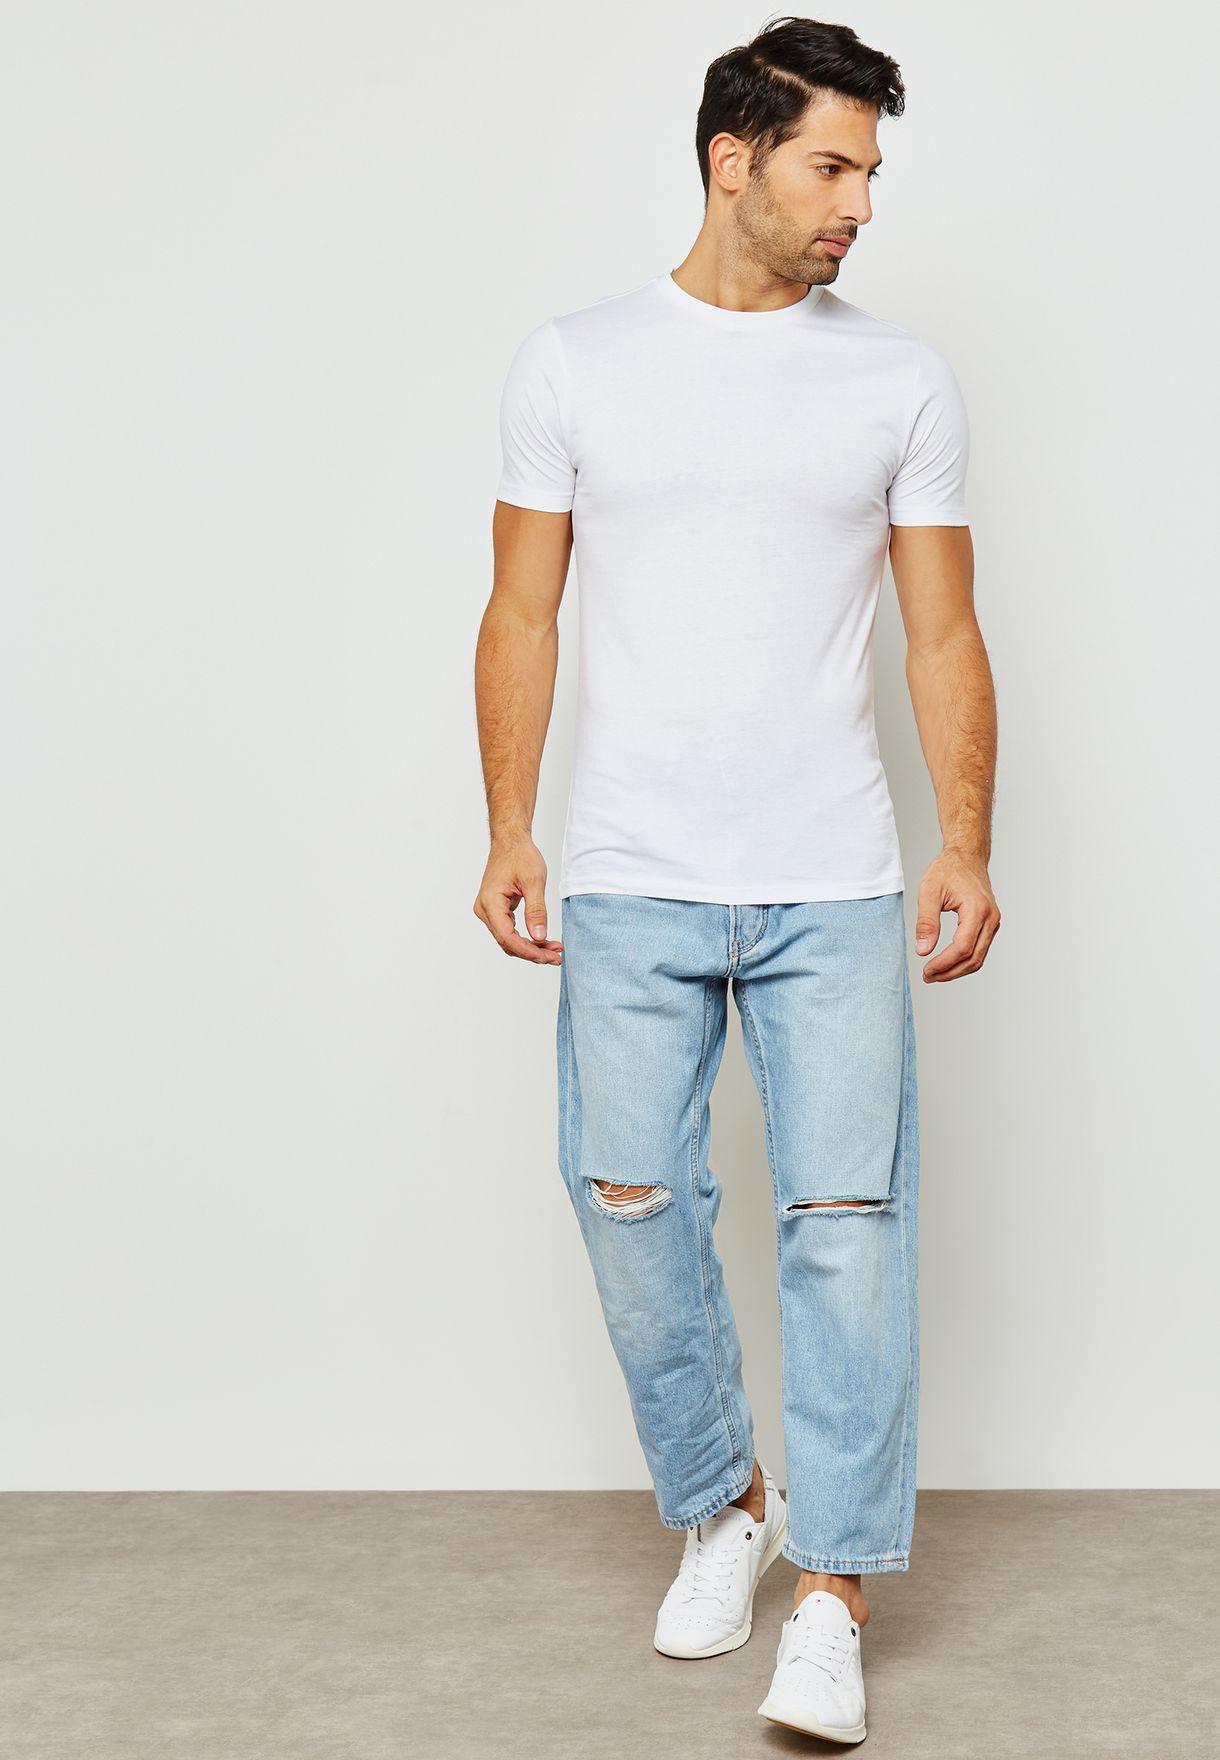 1951 Malbri Jeans